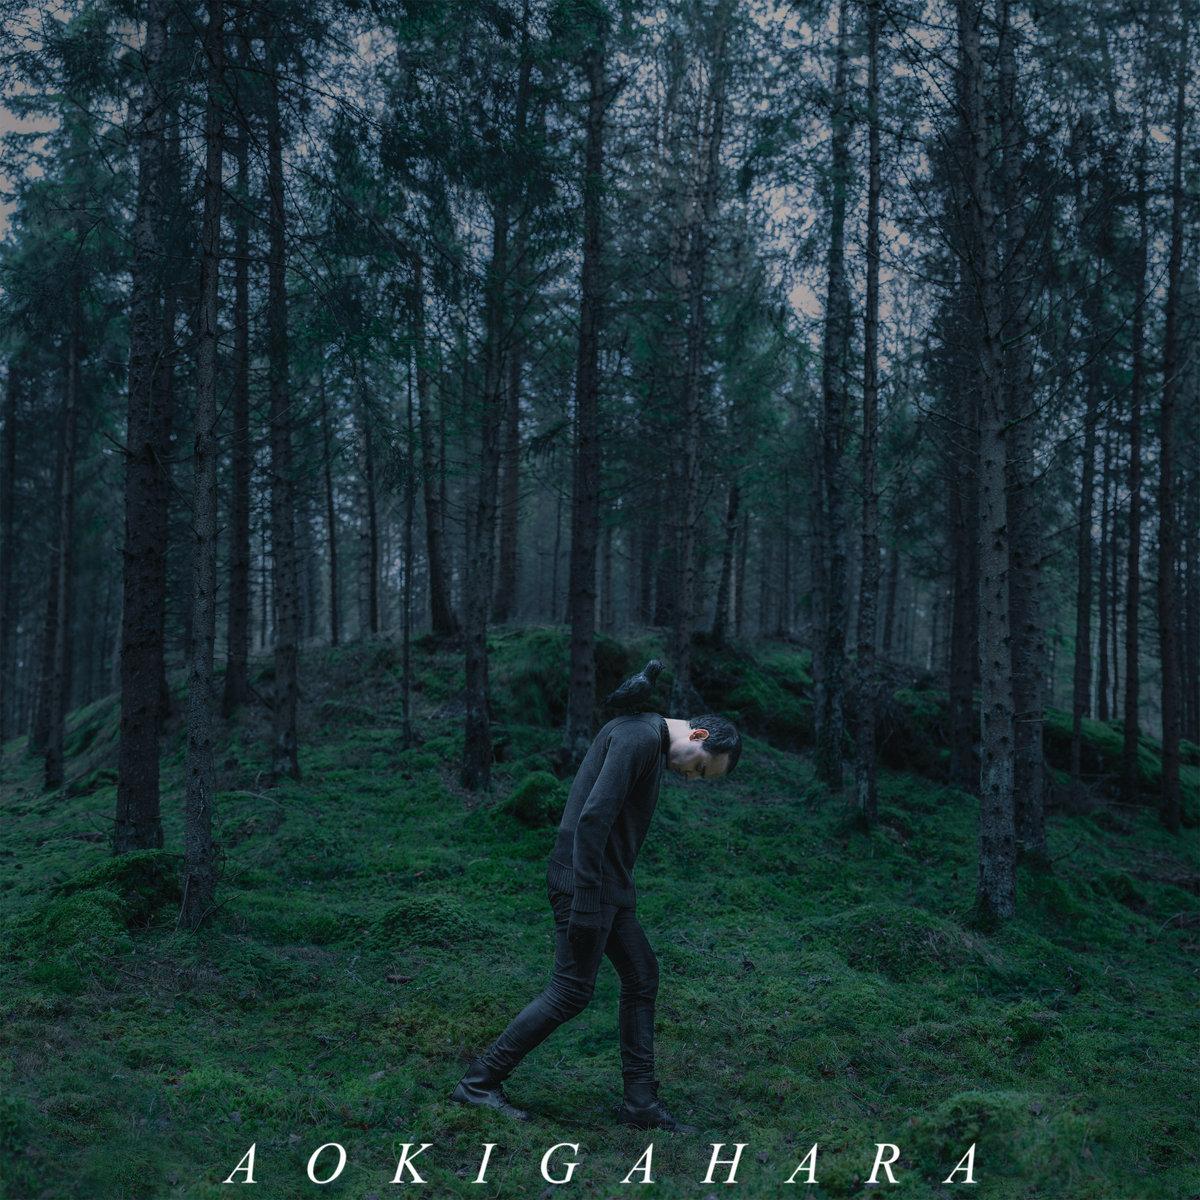 aokigahara | aokigahara: https://aokigaharacult.bandcamp.com